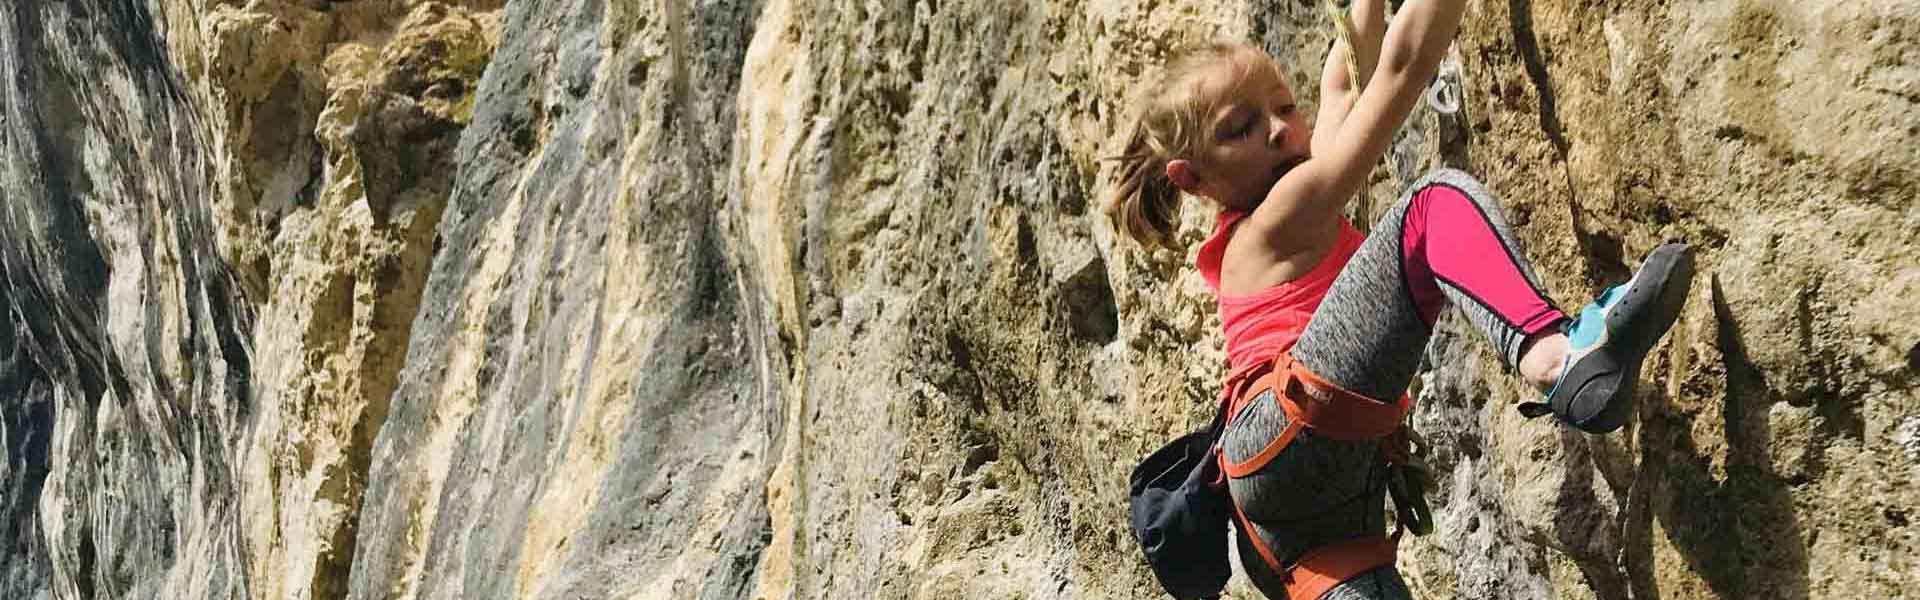 chidren climbing shoe